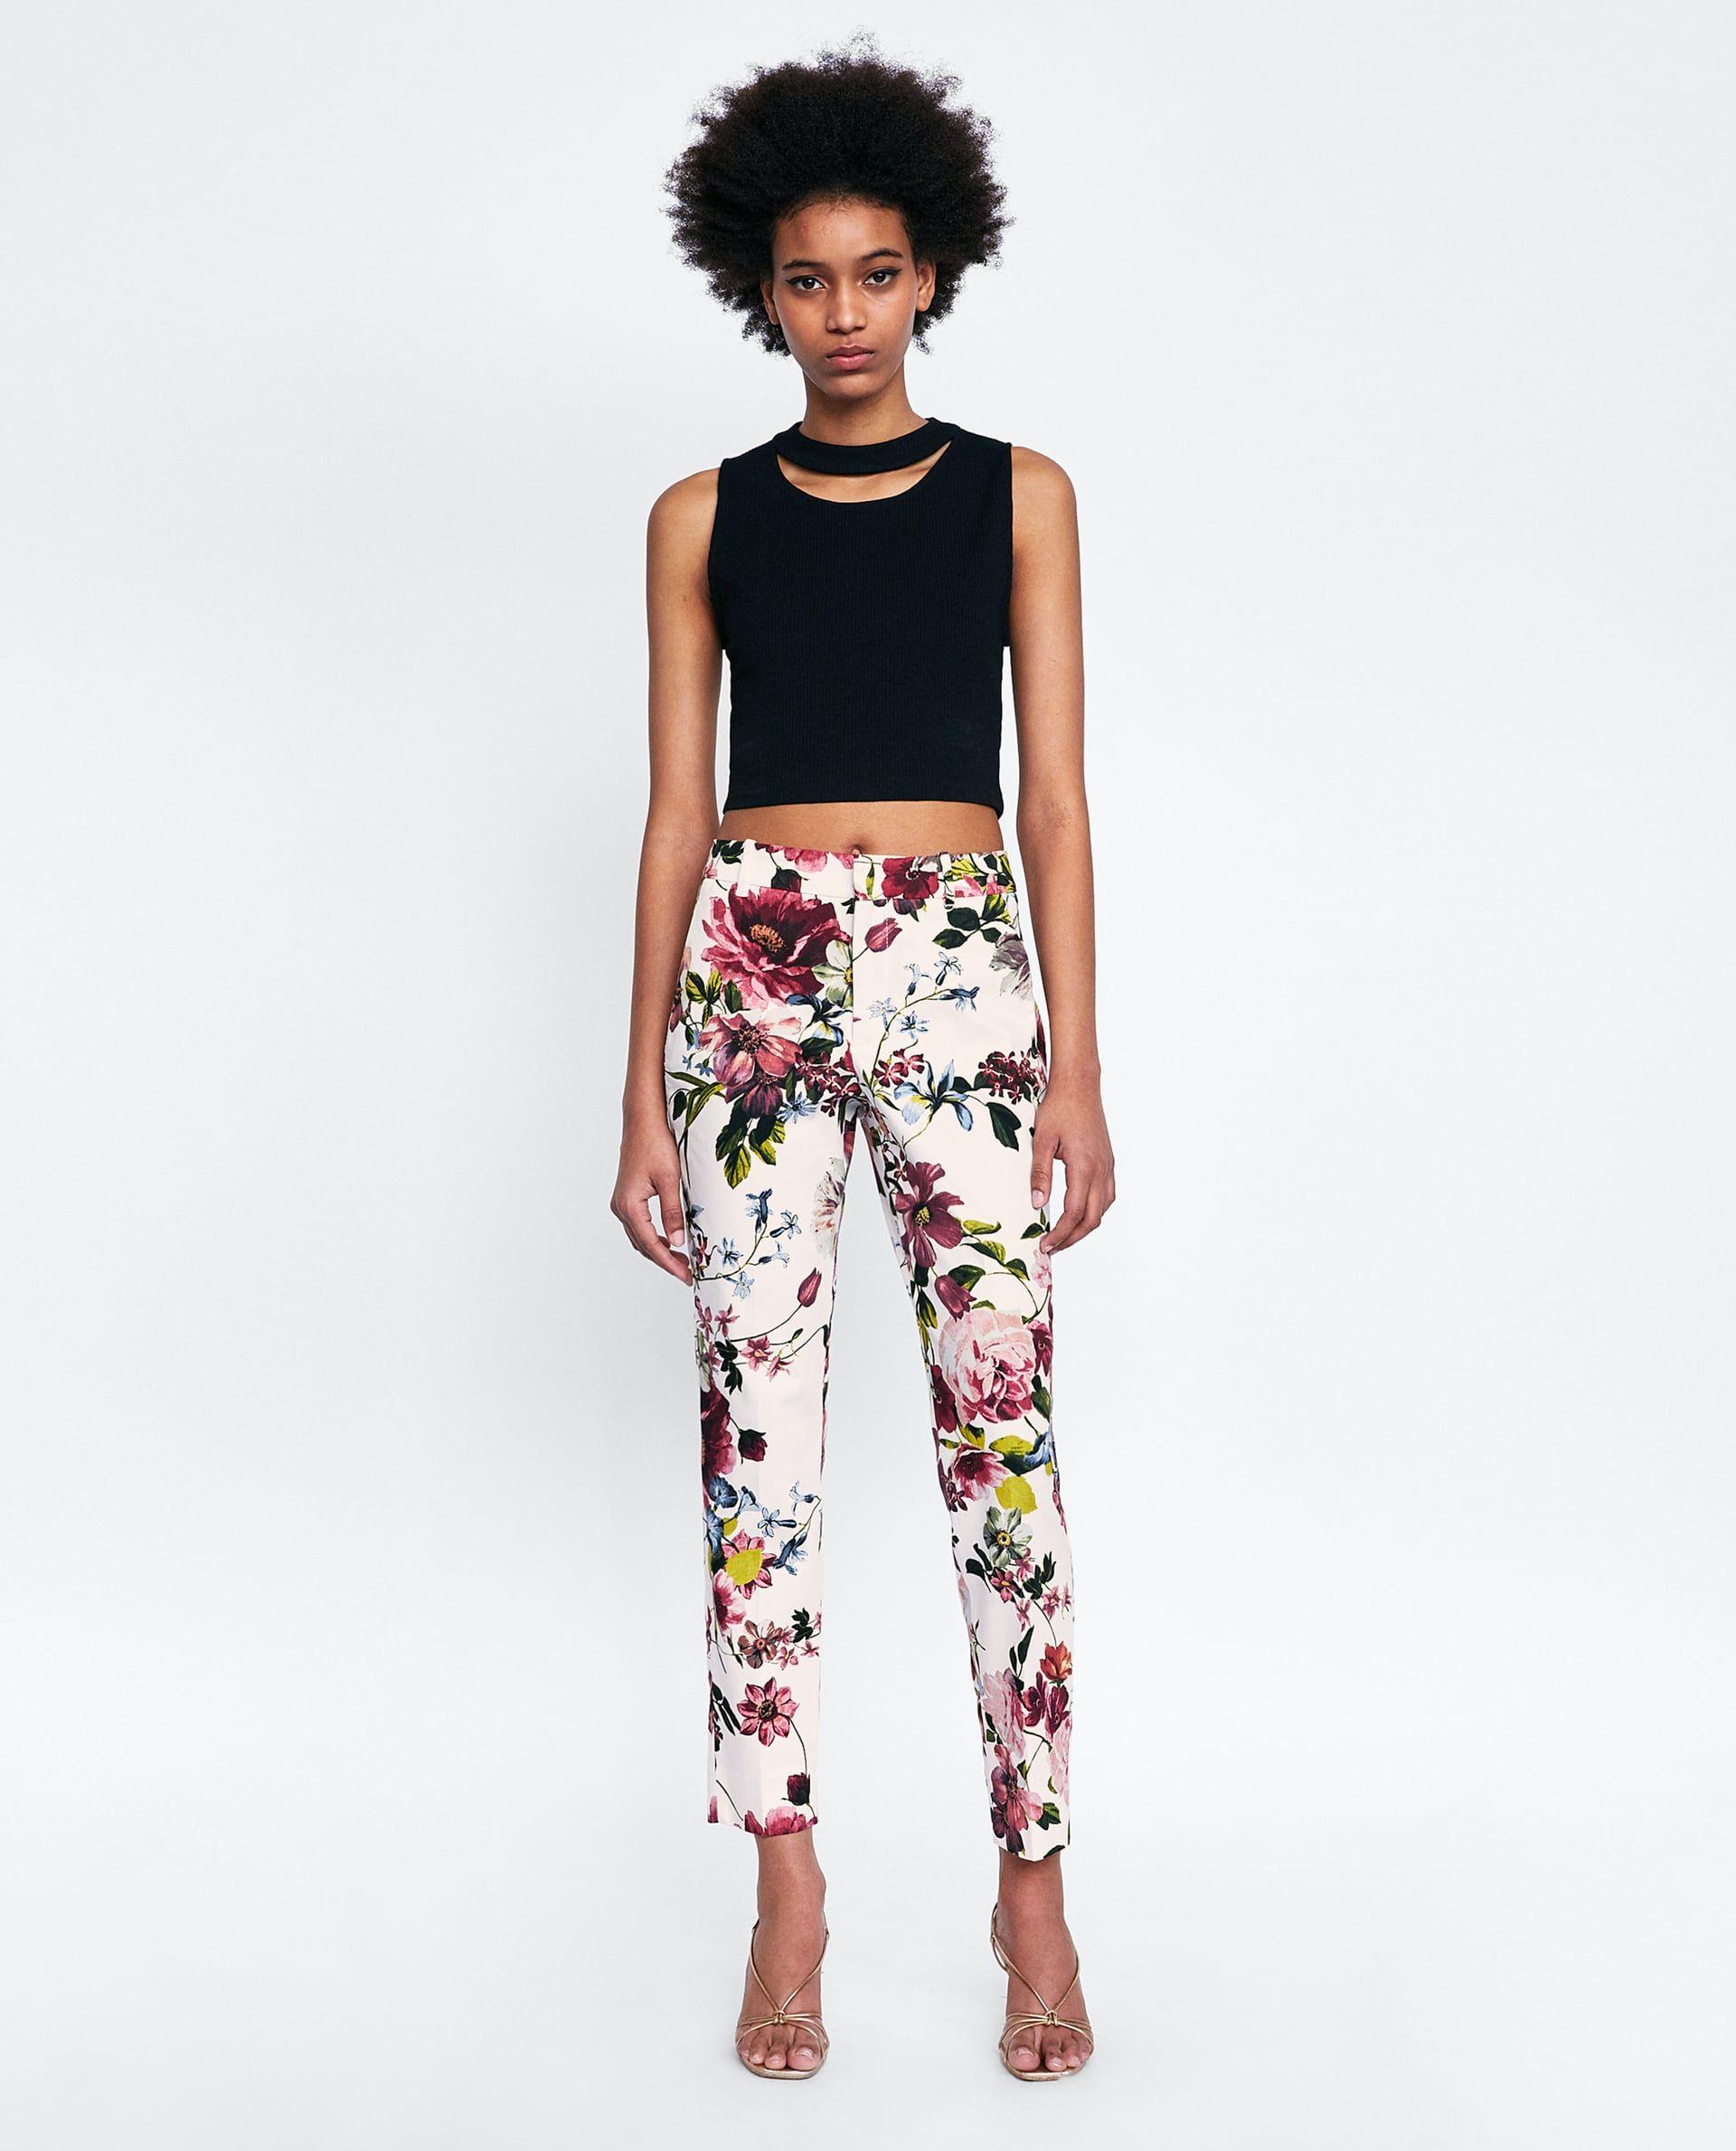 Pantalon Chino Estampado Floral Stripes And Floral Clothing